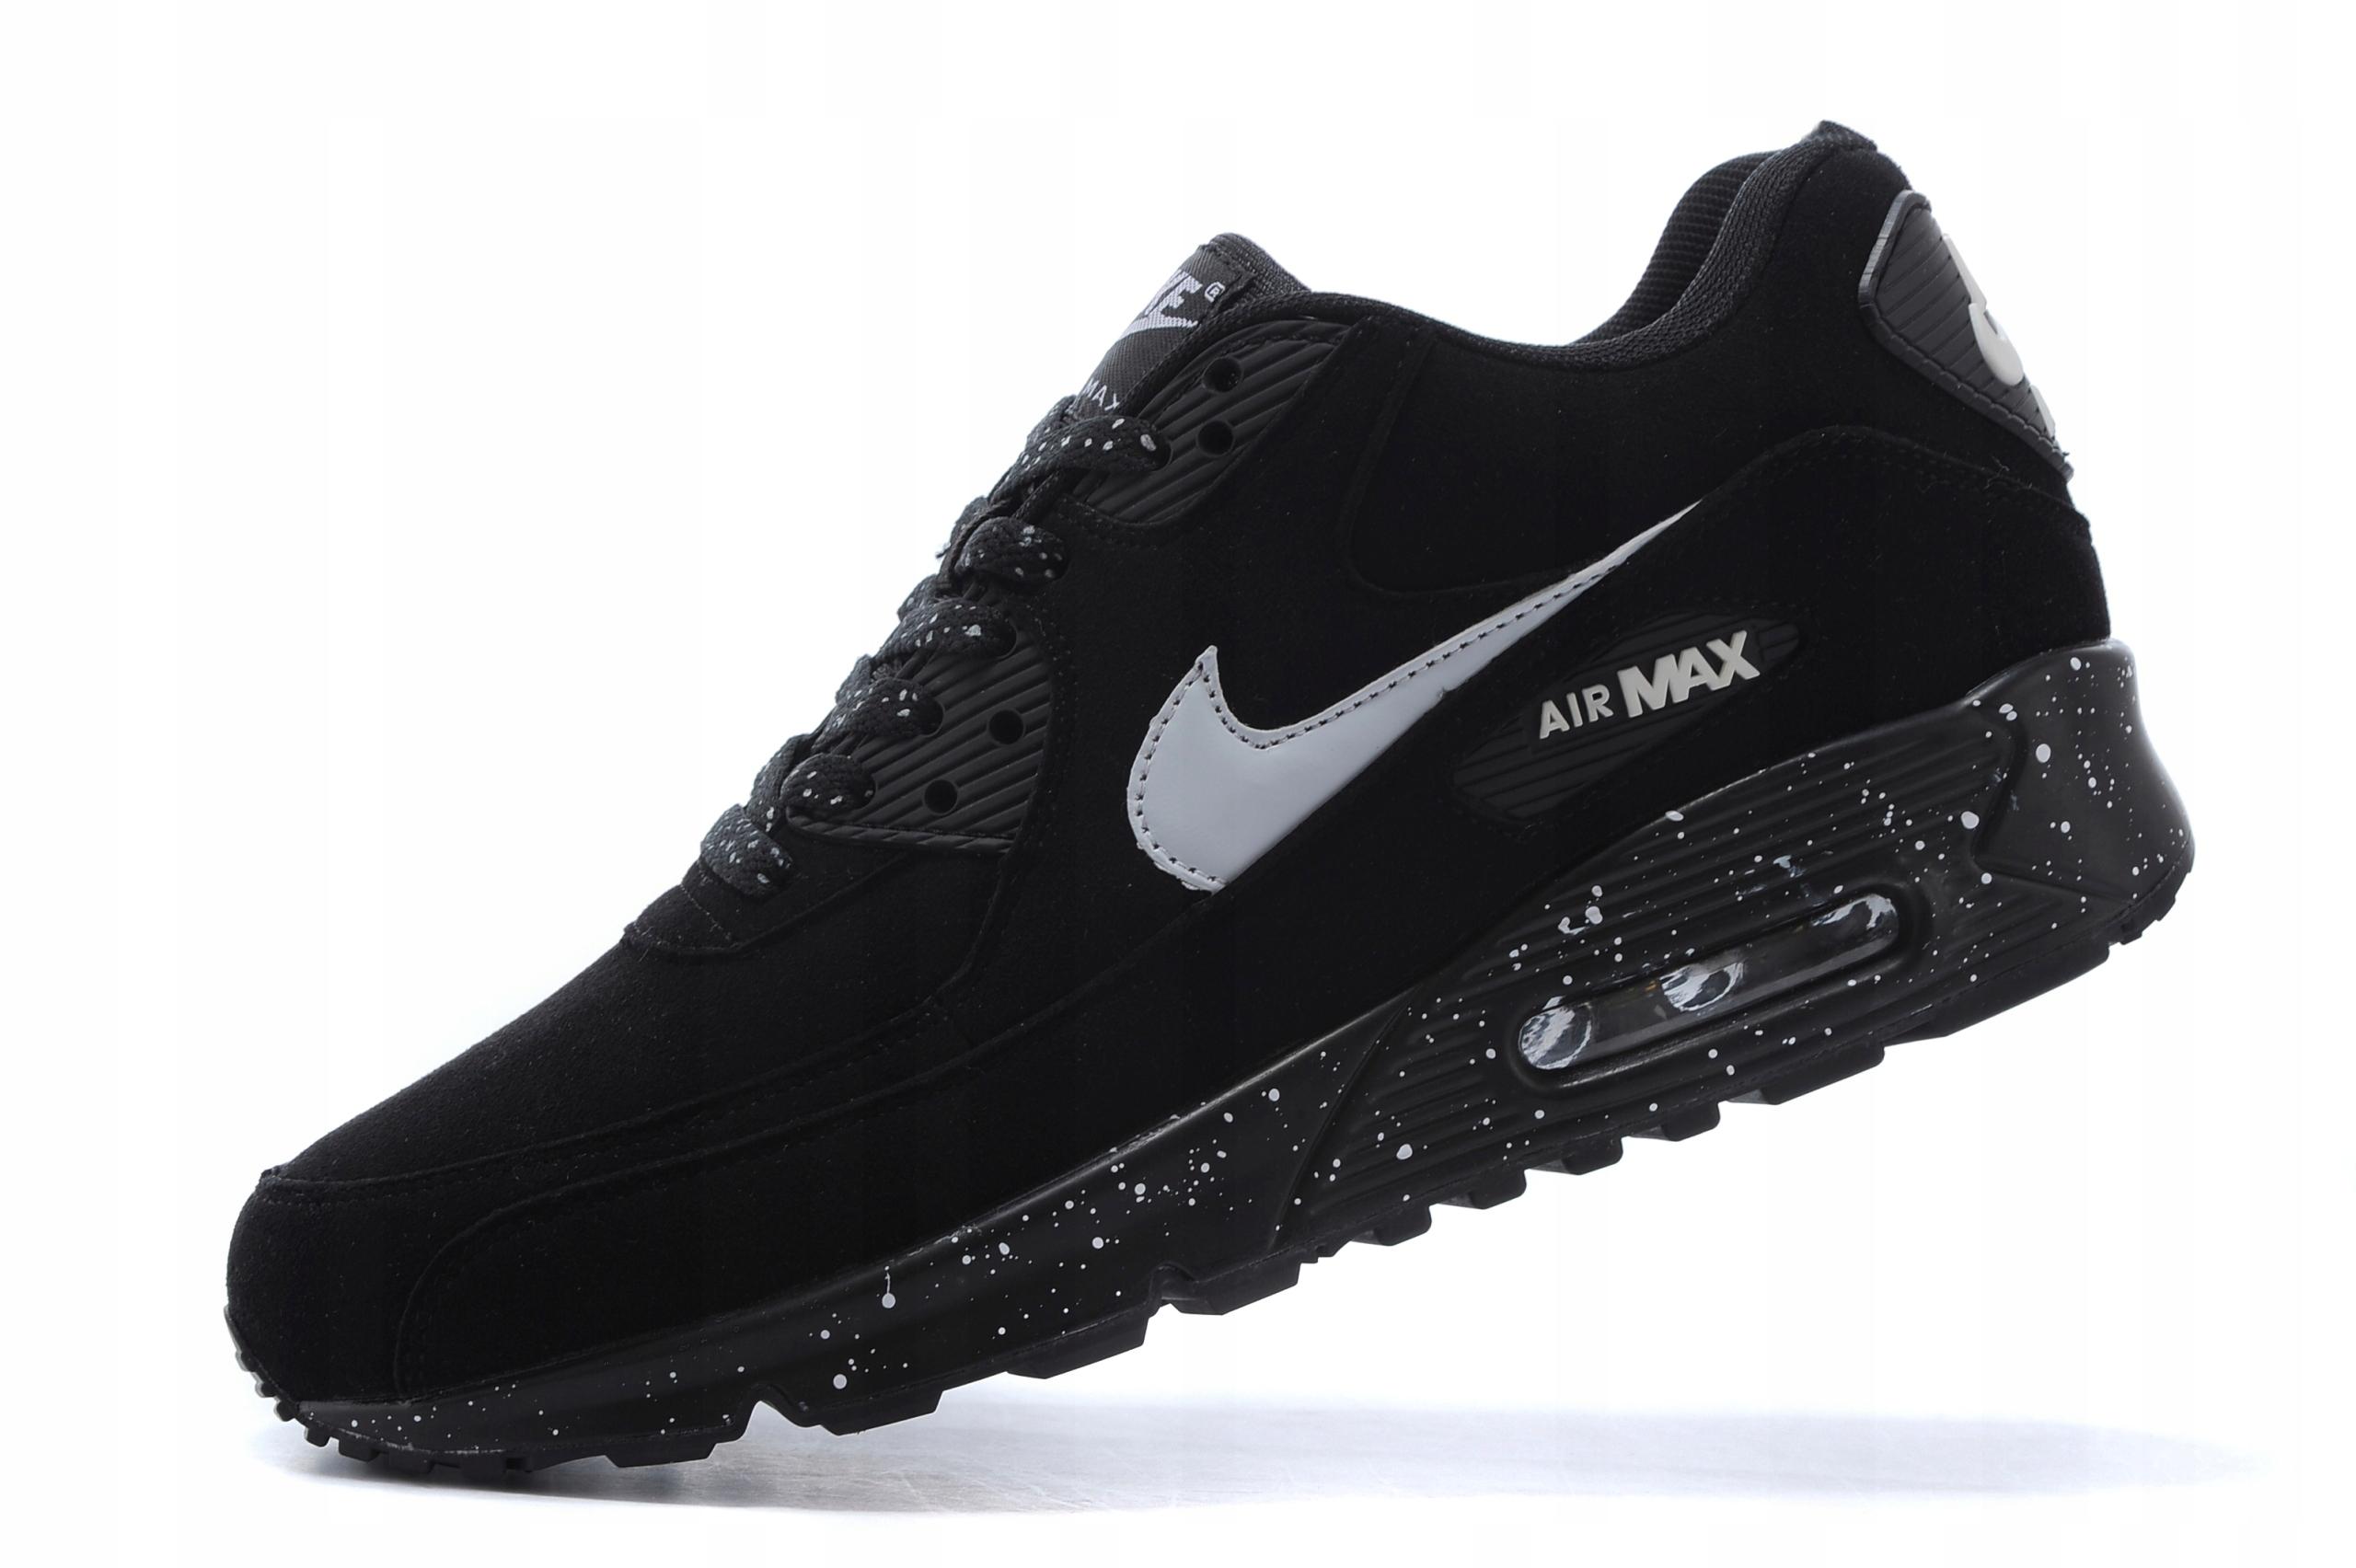 Buty DAMSKIE Nike Air Max OREO r.37 Promocja 7537272859